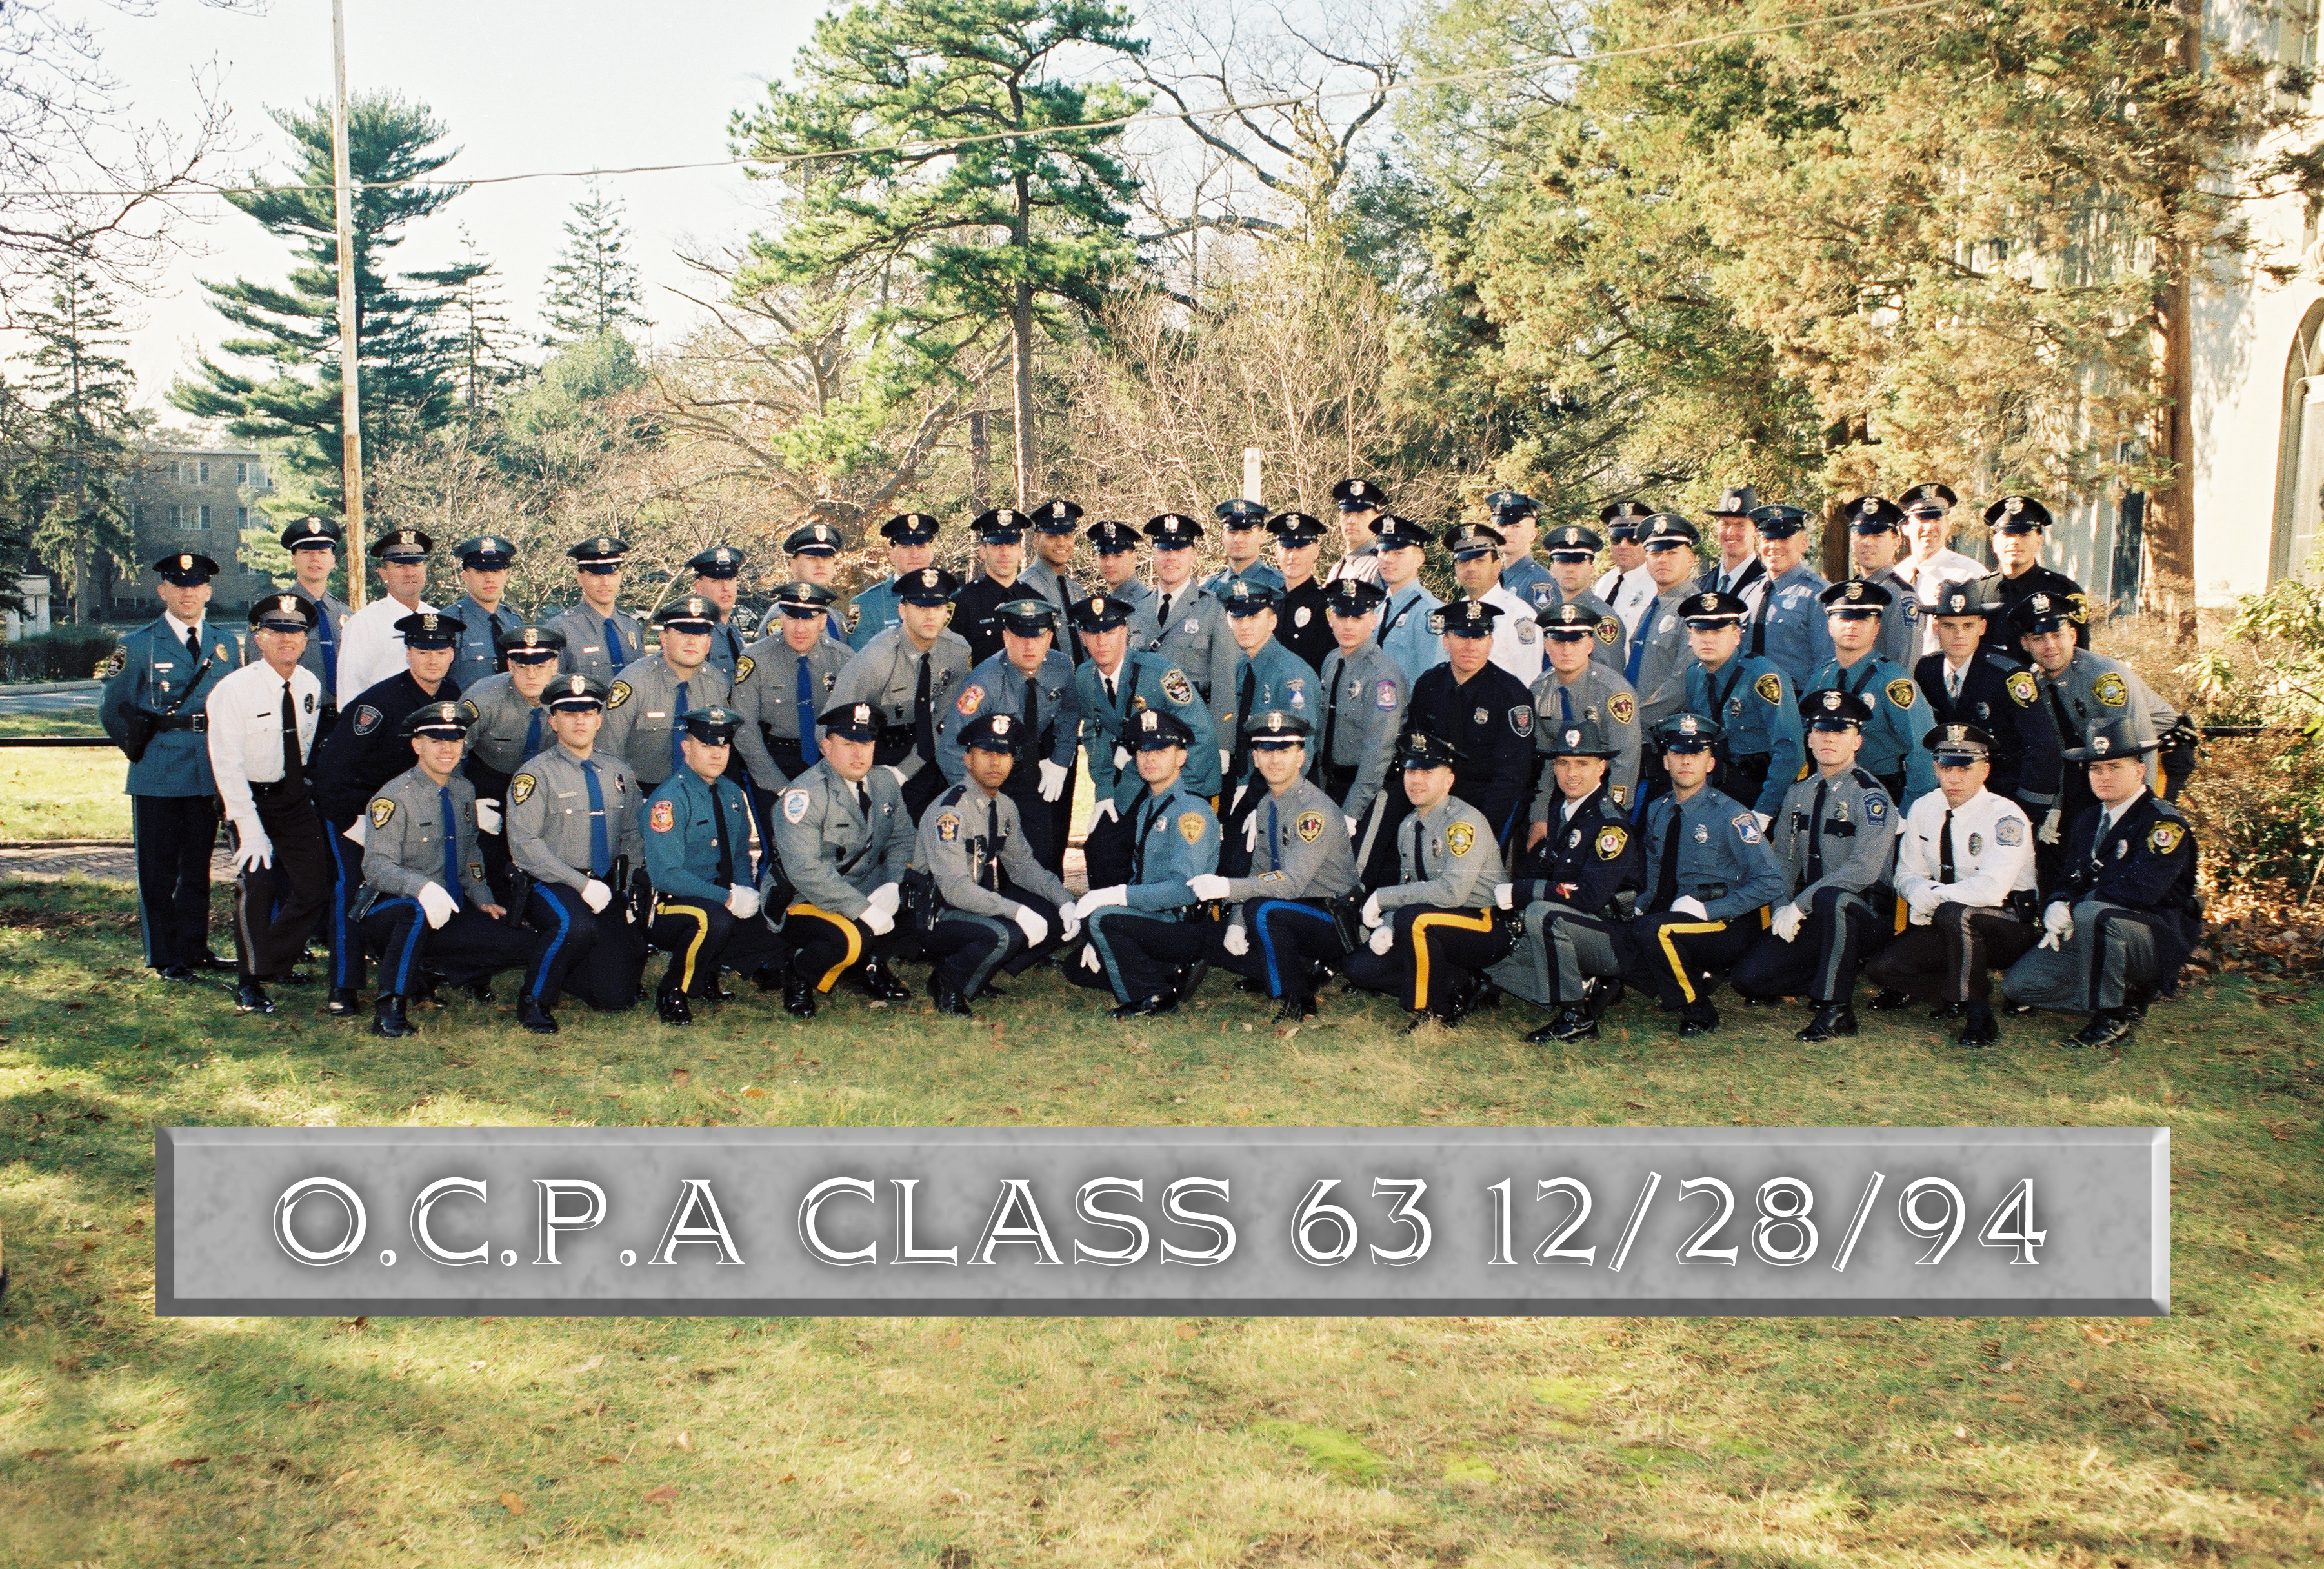 Class #63